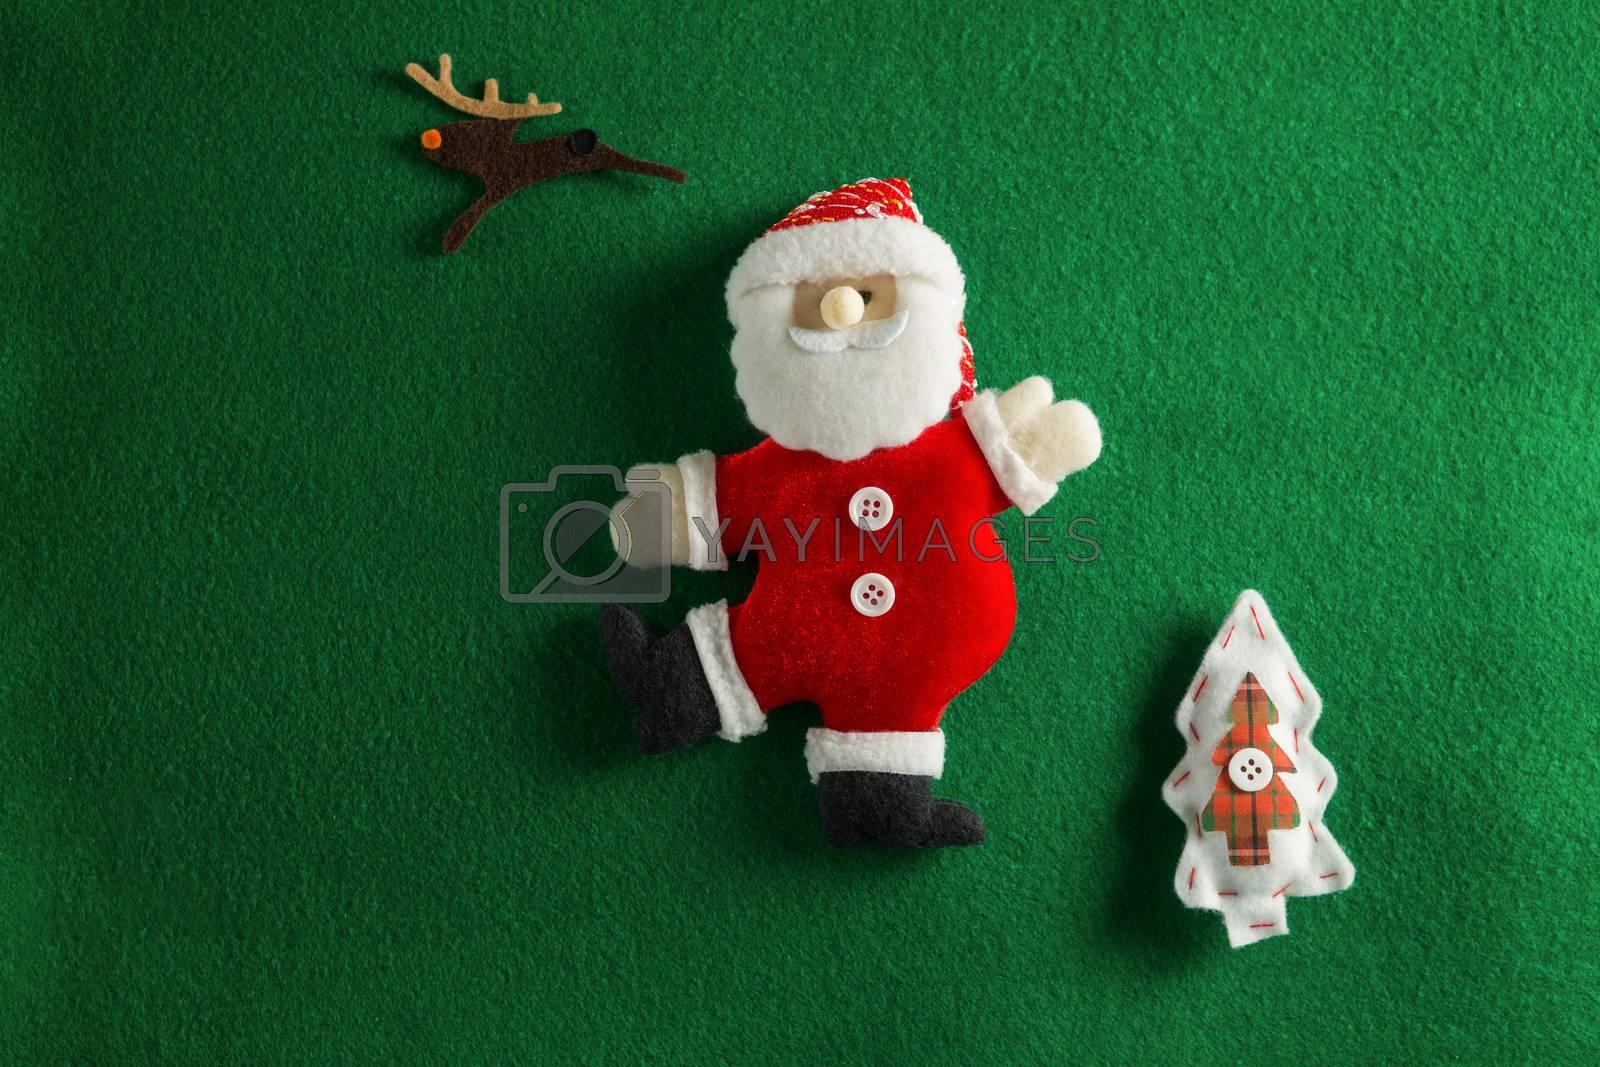 Christmas decoration on green background by Wavebreakmedia